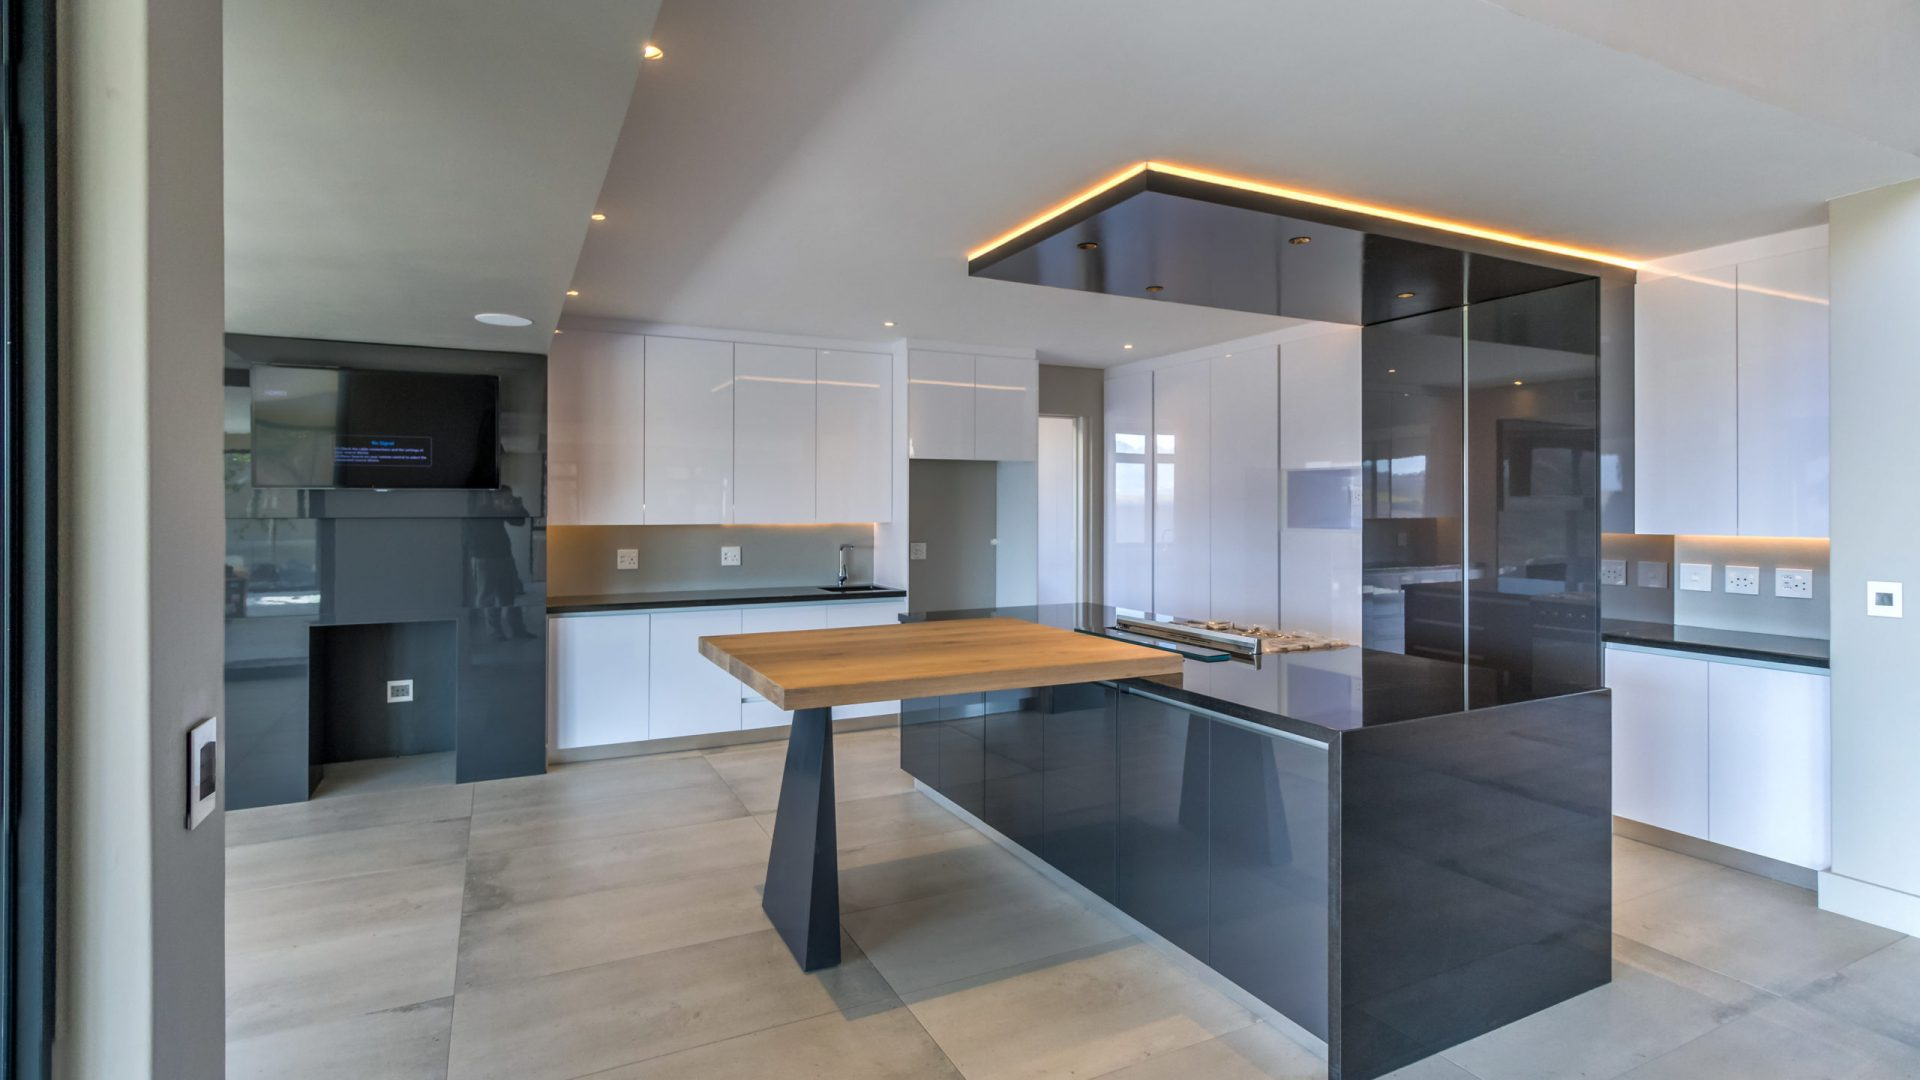 Pinnacle Projects - 20 Longlands Estate, Stellenbosch - 20190417 - _MG_8960_1_2